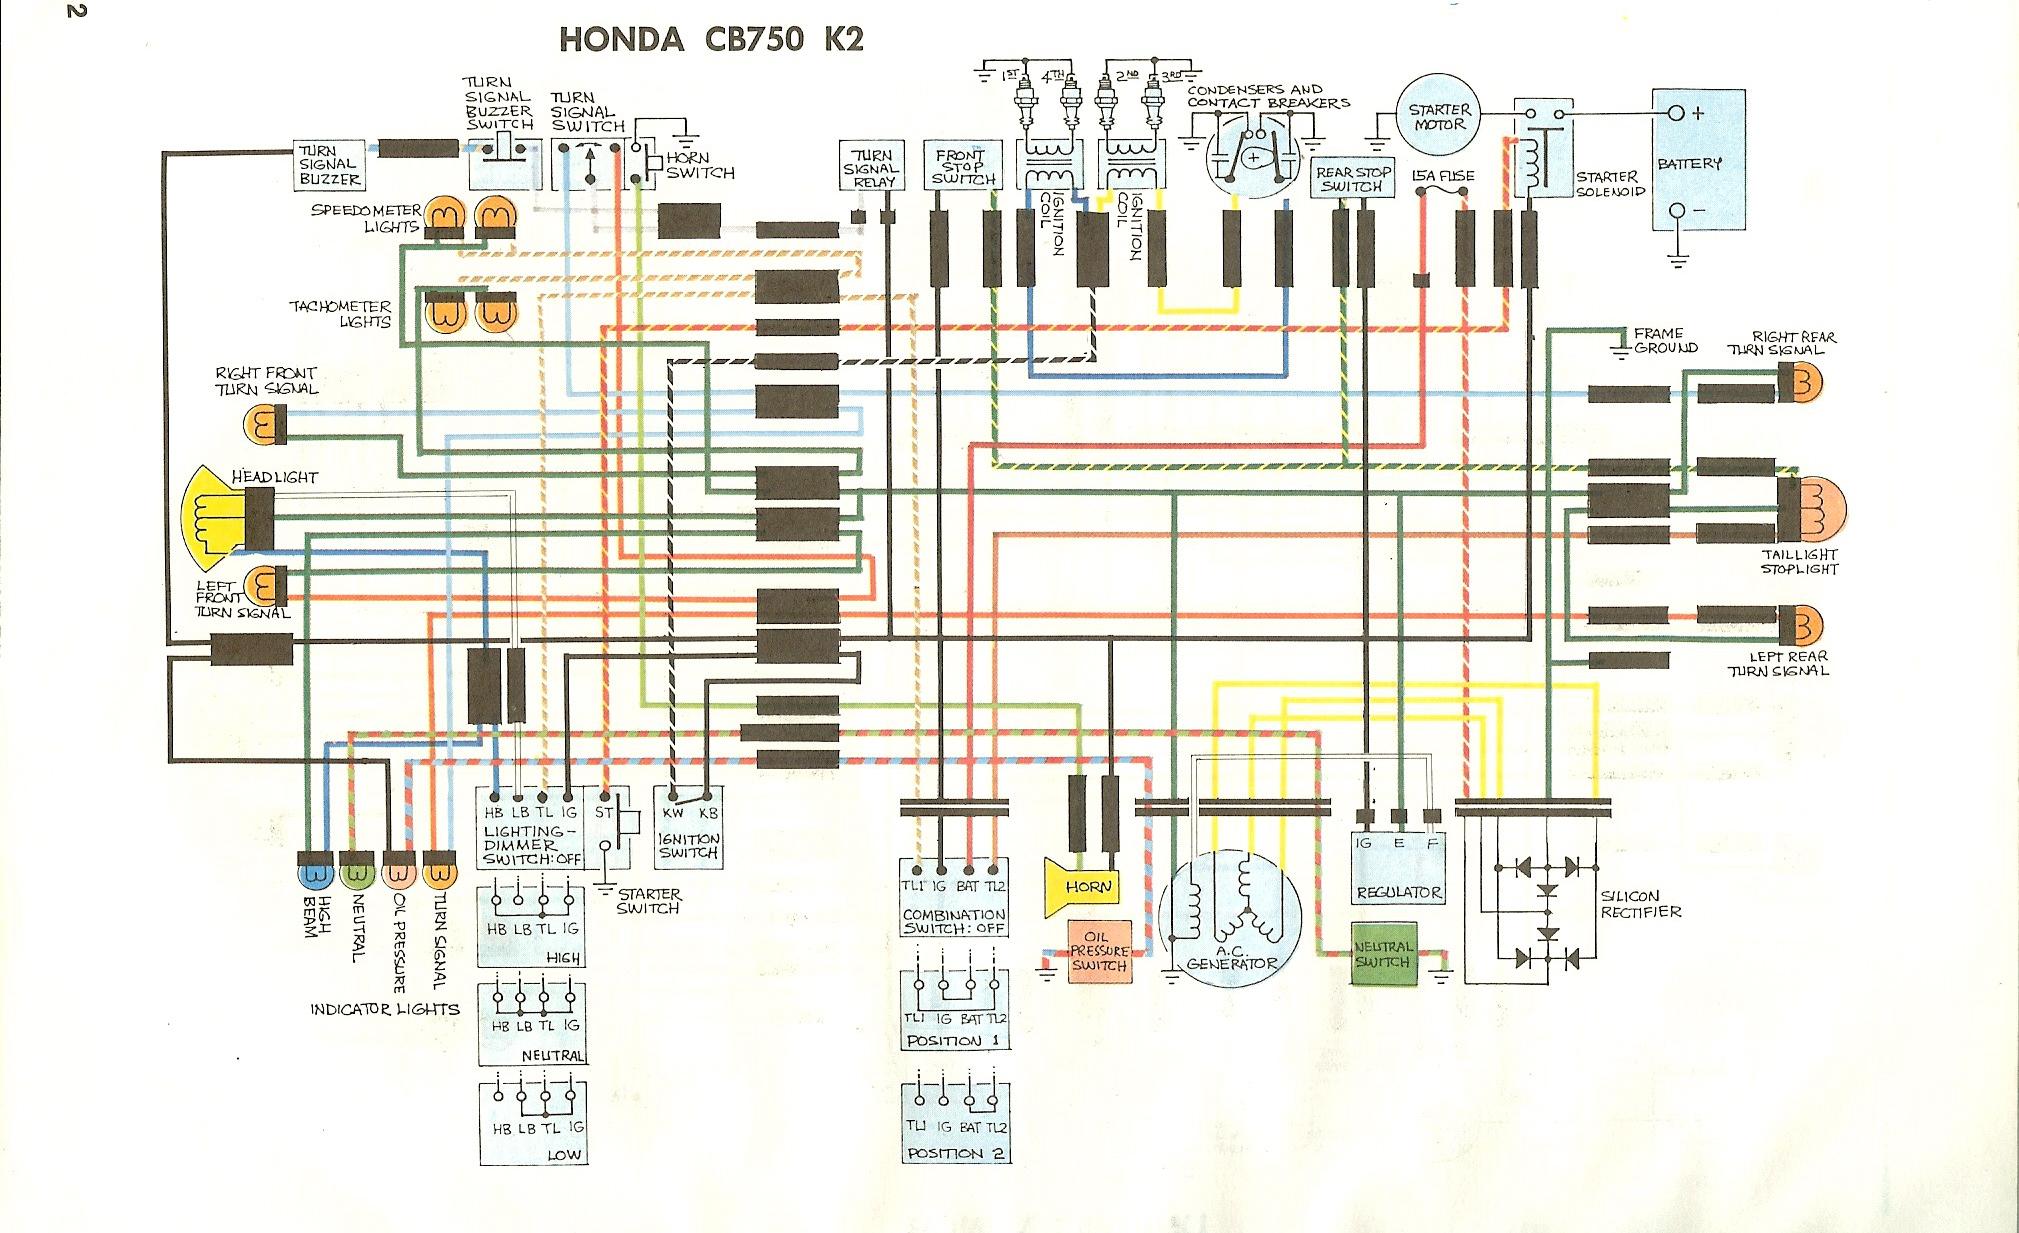 WD750K2 honda cb1000 wiring diagram wiring library modern home revolution